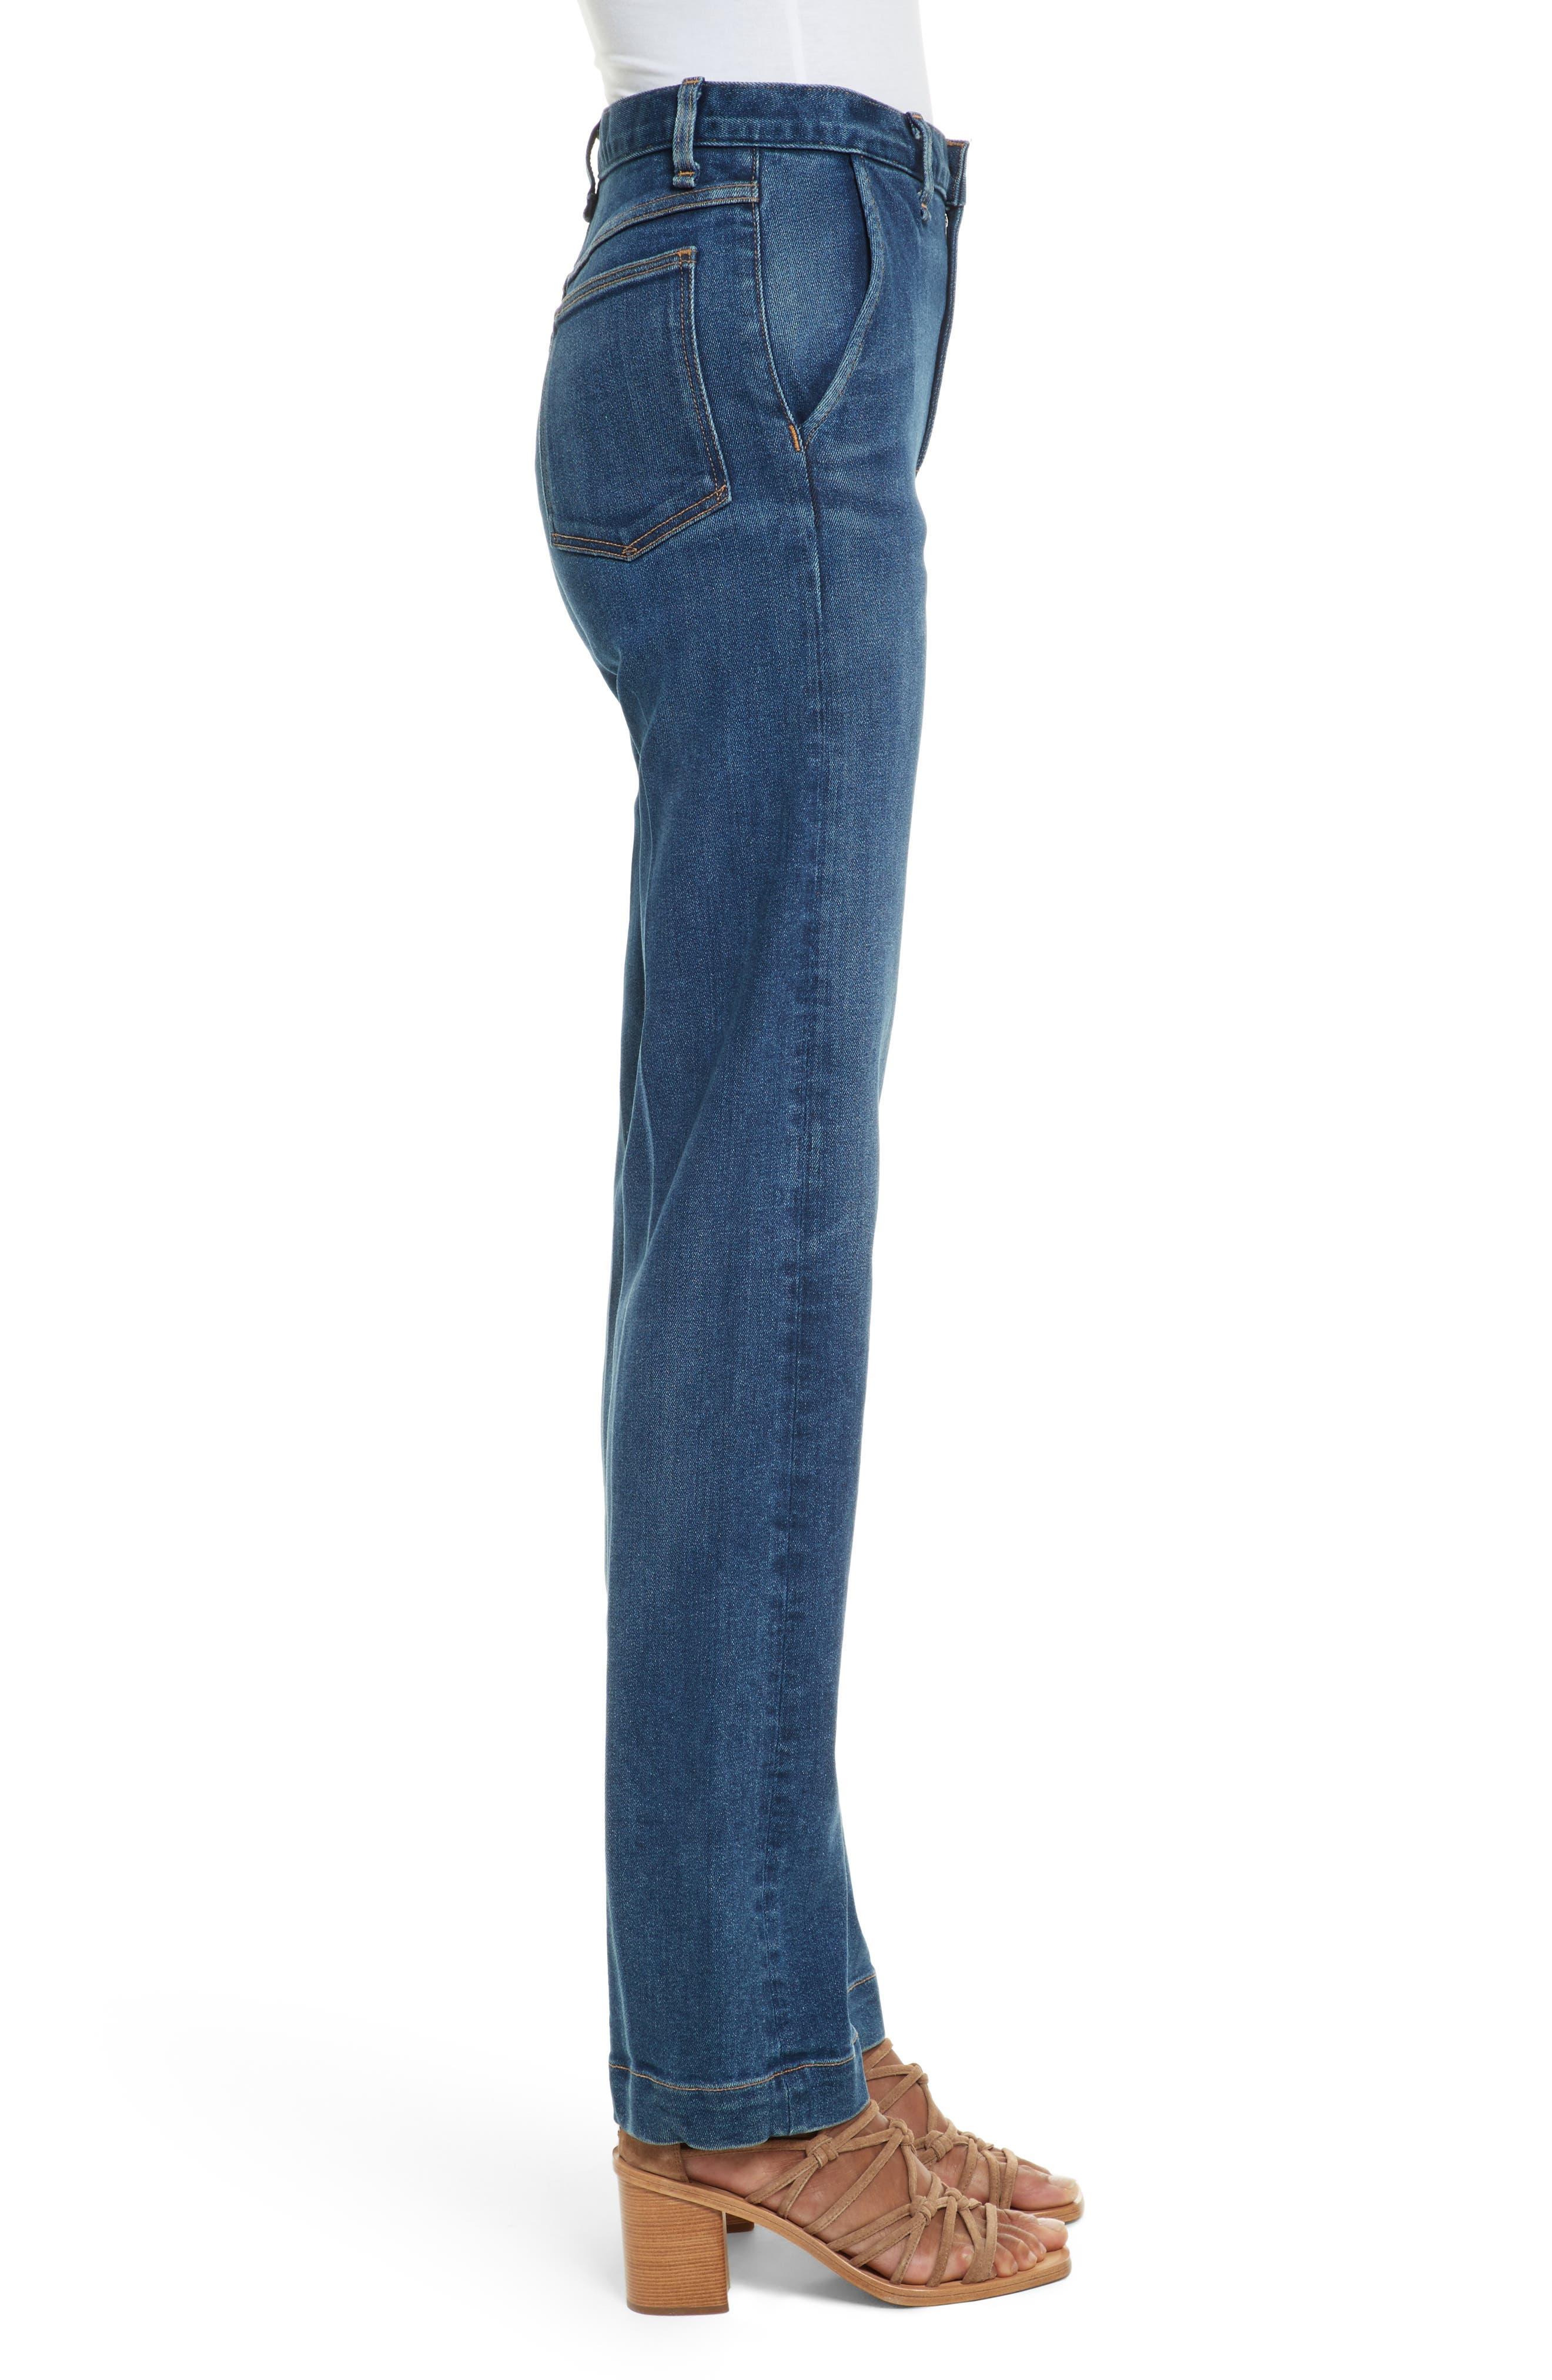 Justine High Waist Trouser Jeans,                             Alternate thumbnail 3, color,                             462